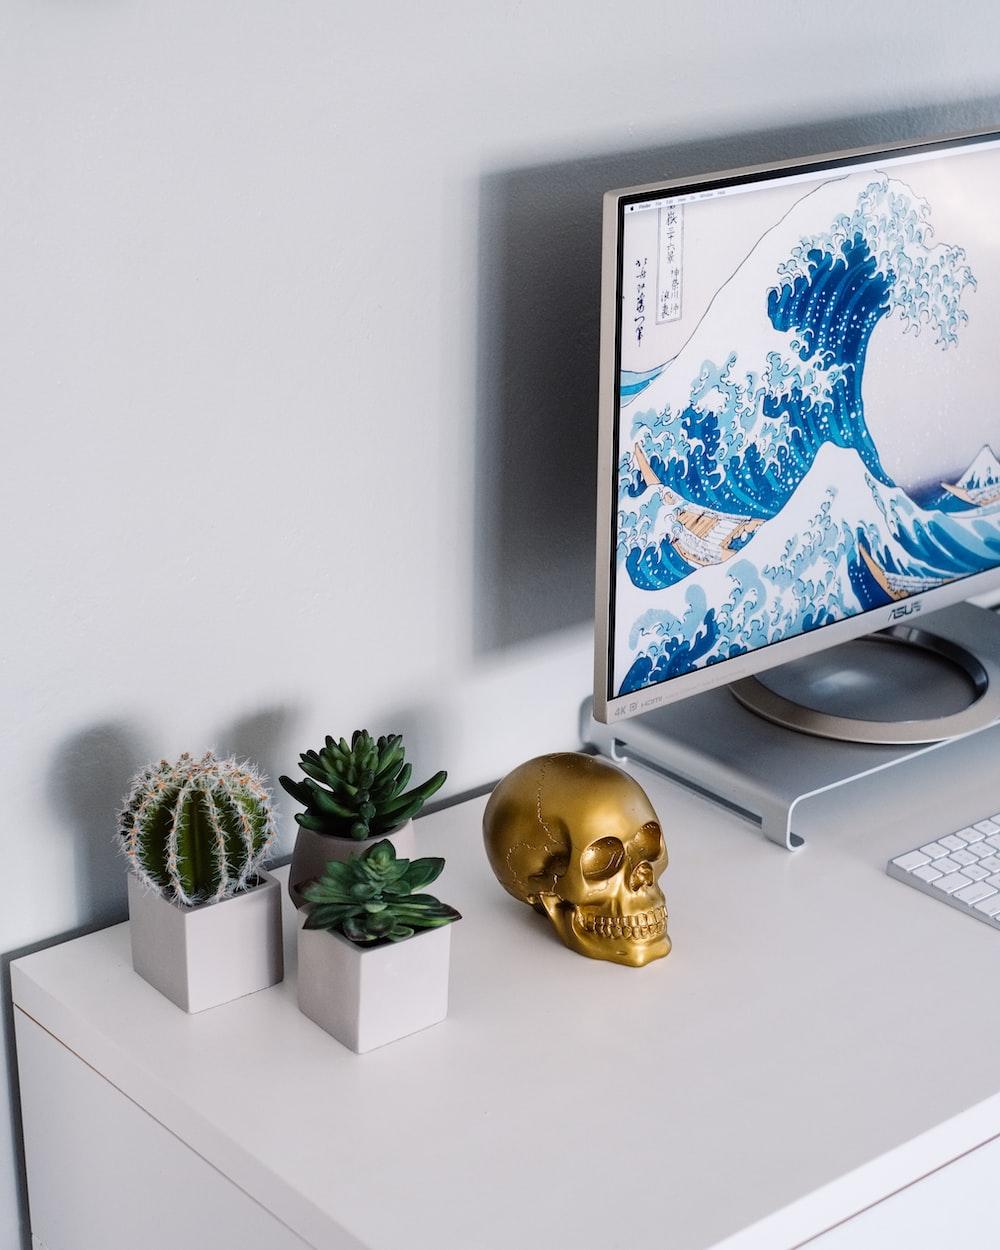 gray flat screen computer monitor beside gold skull ornament